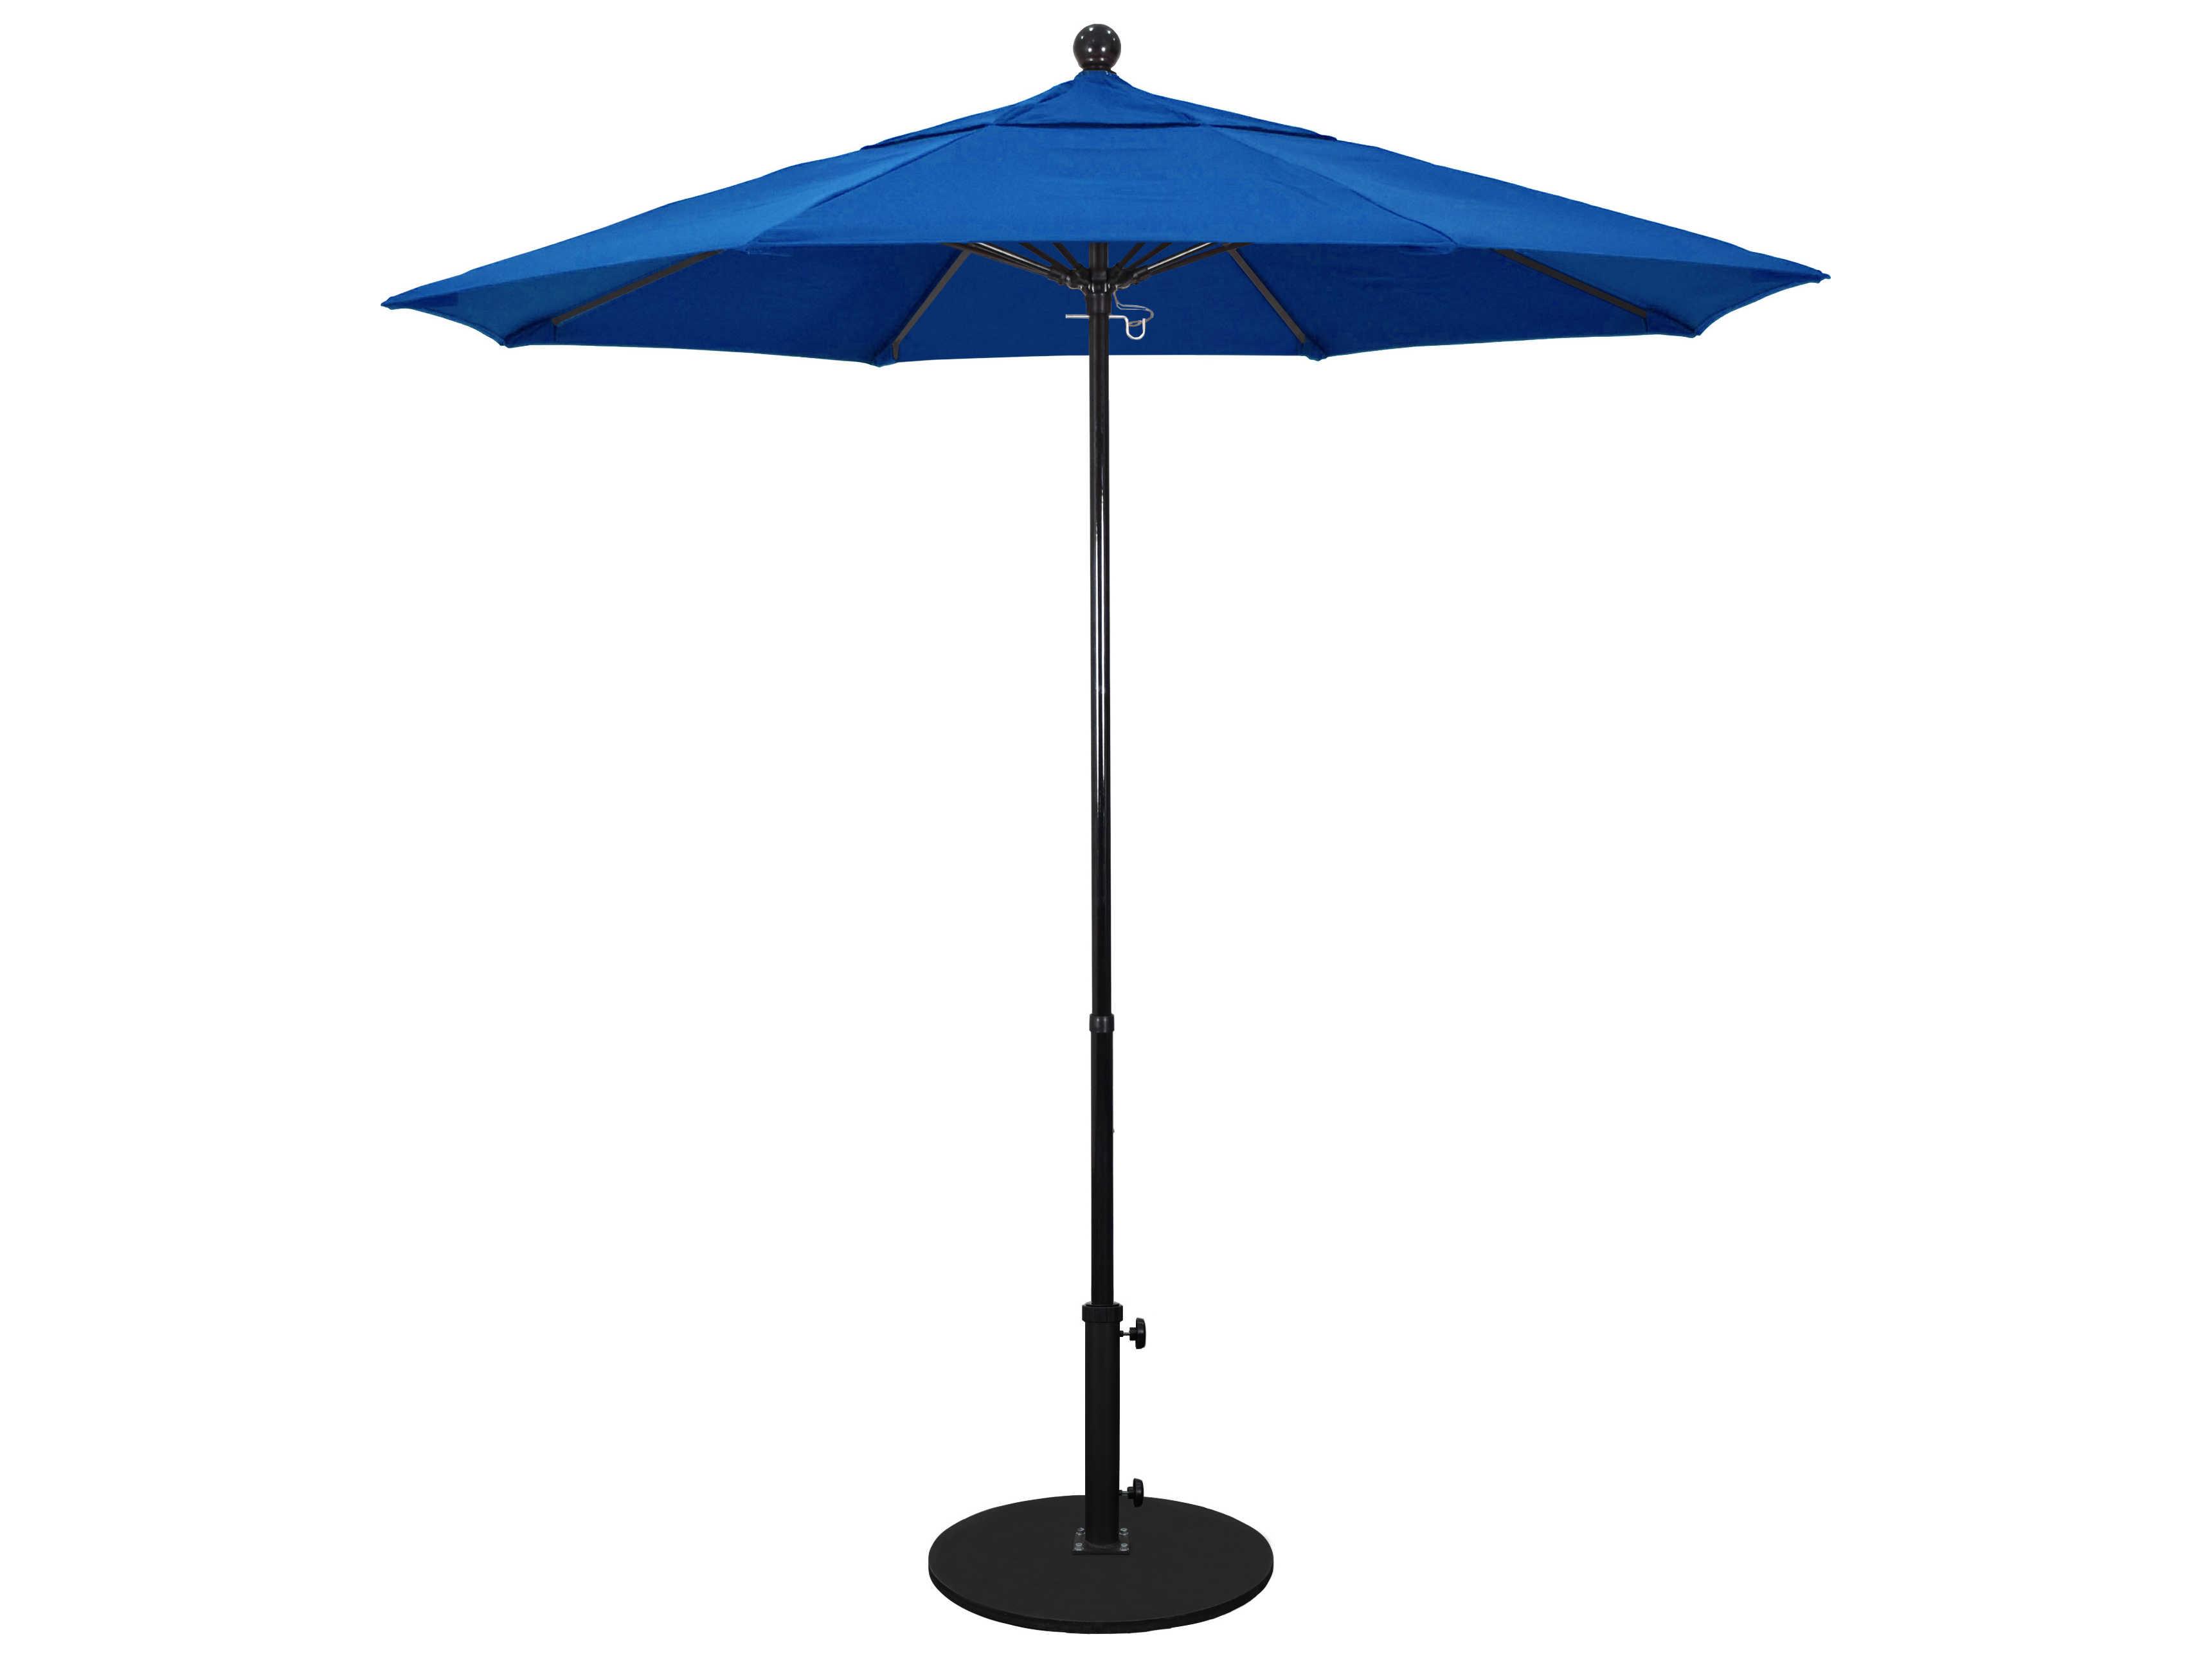 California Umbrella Oceanside Series 75 Foot Octagon